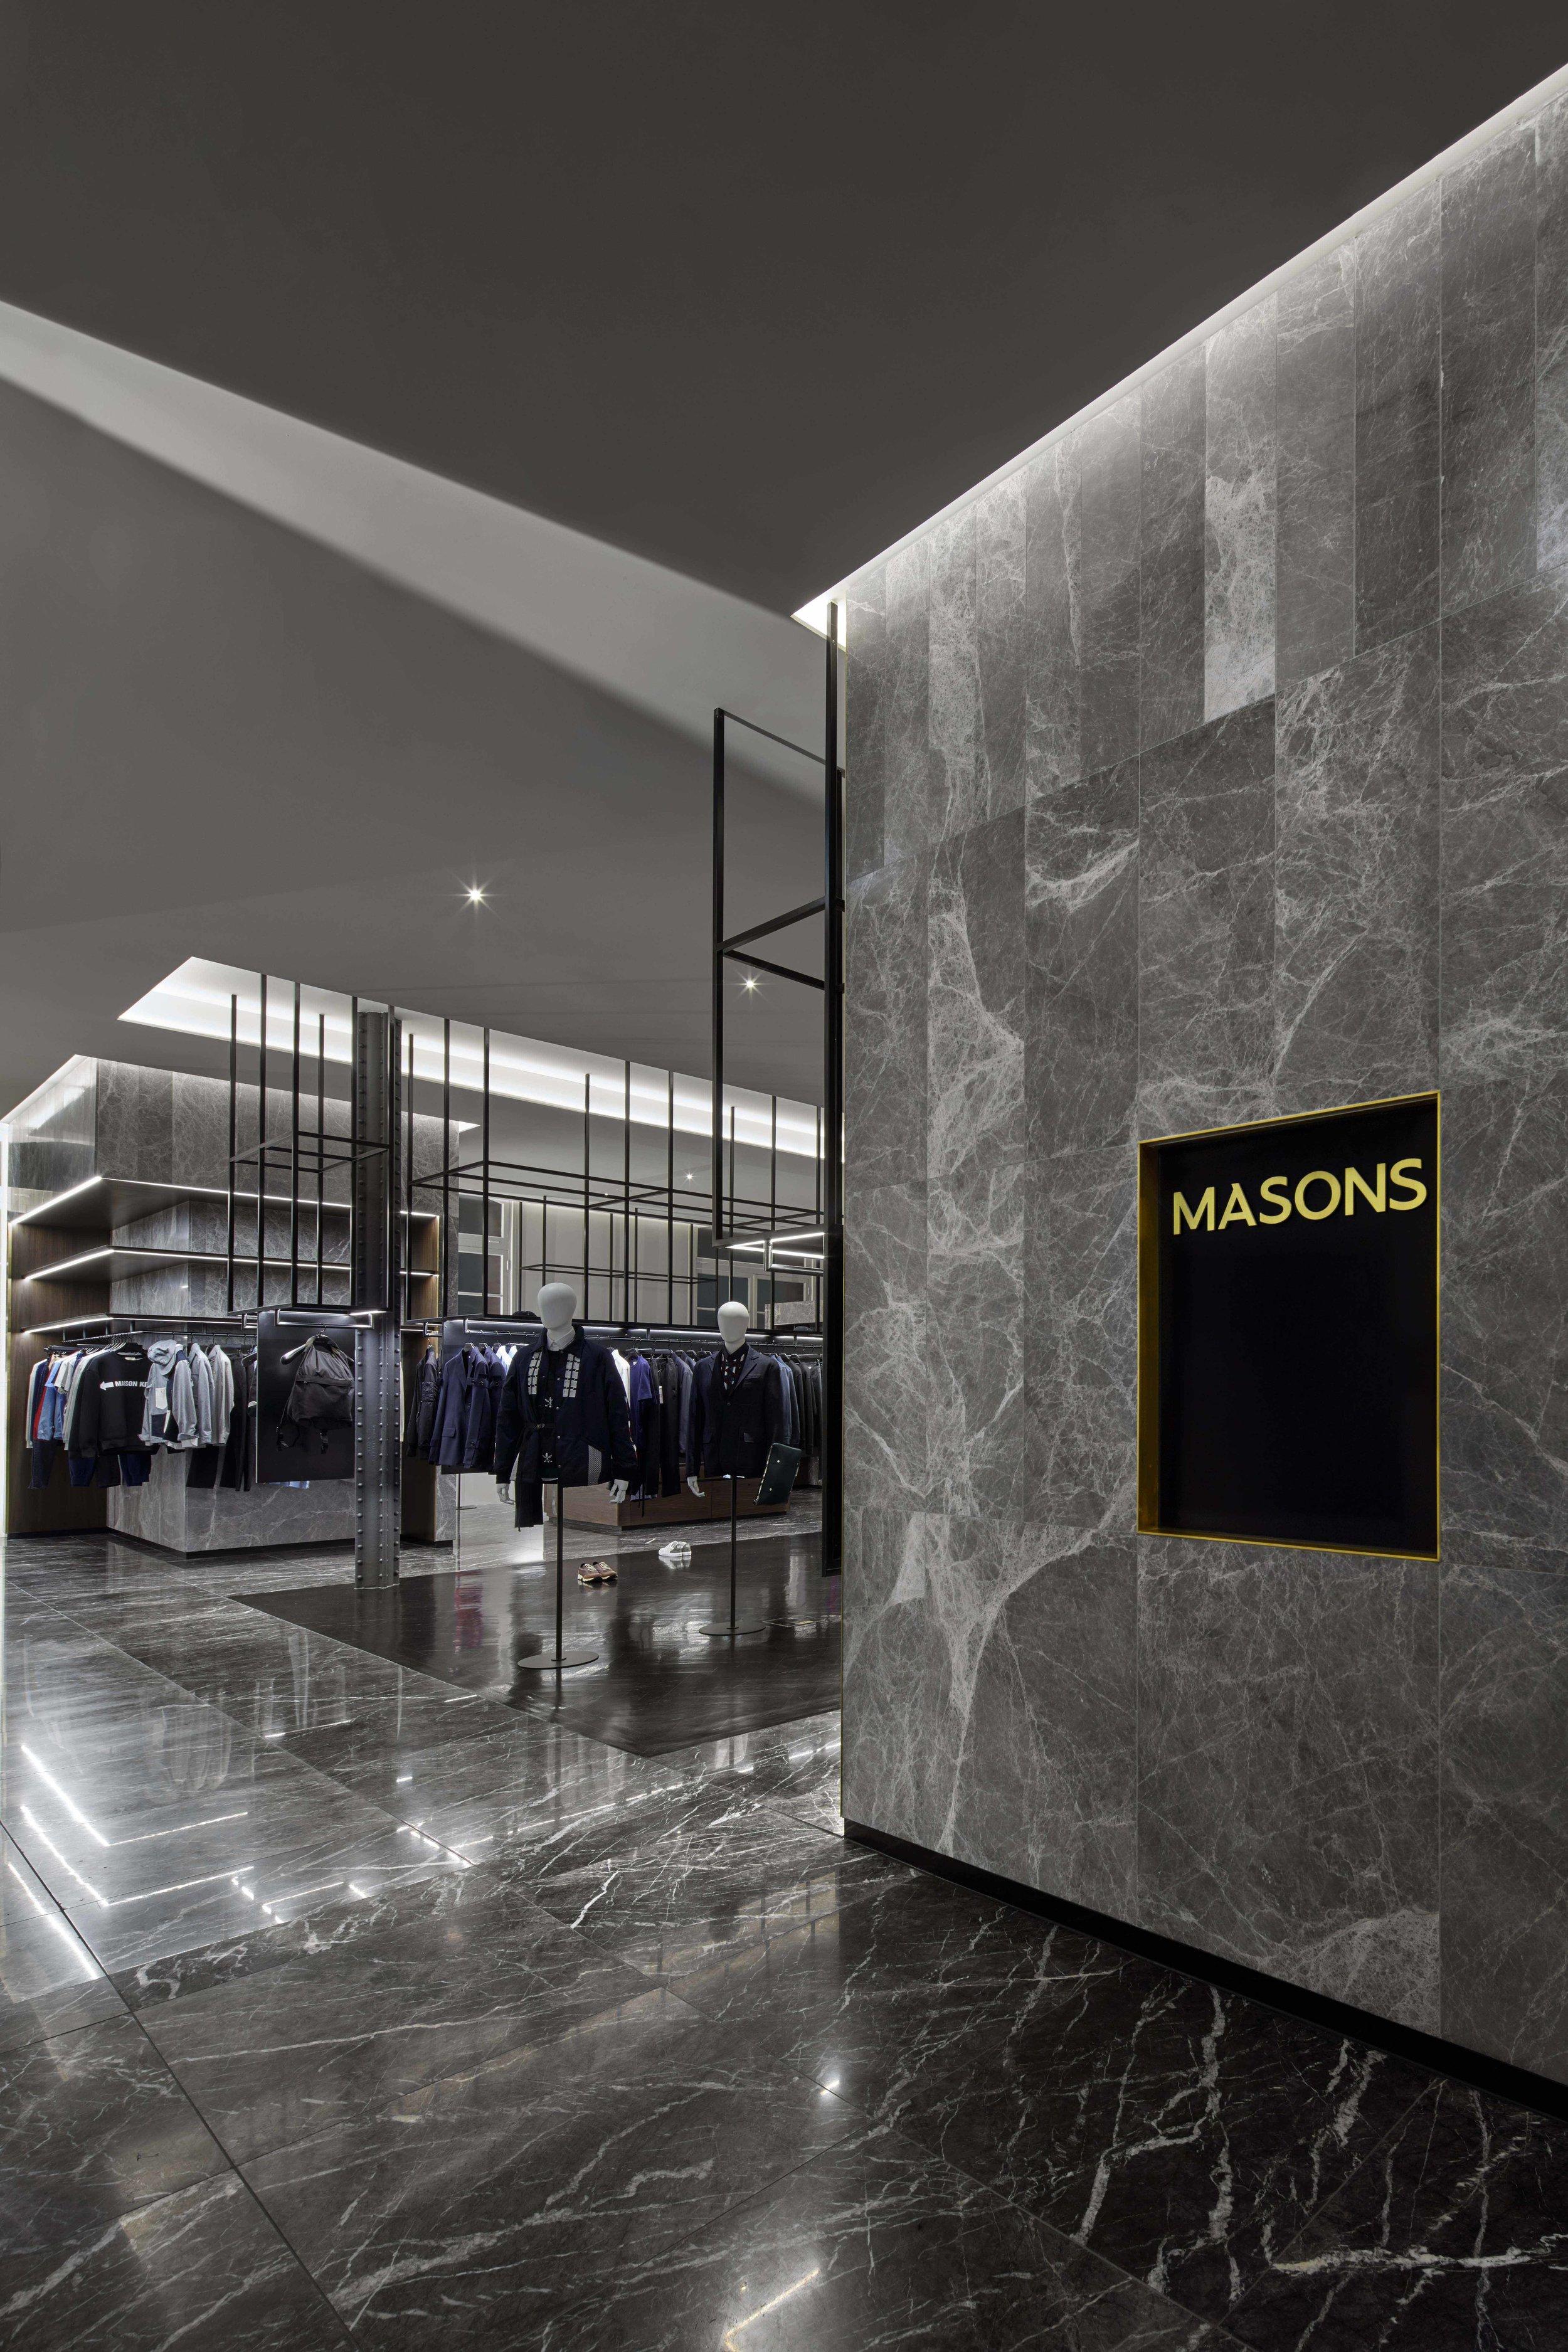 Masons_0183_sml.jpg